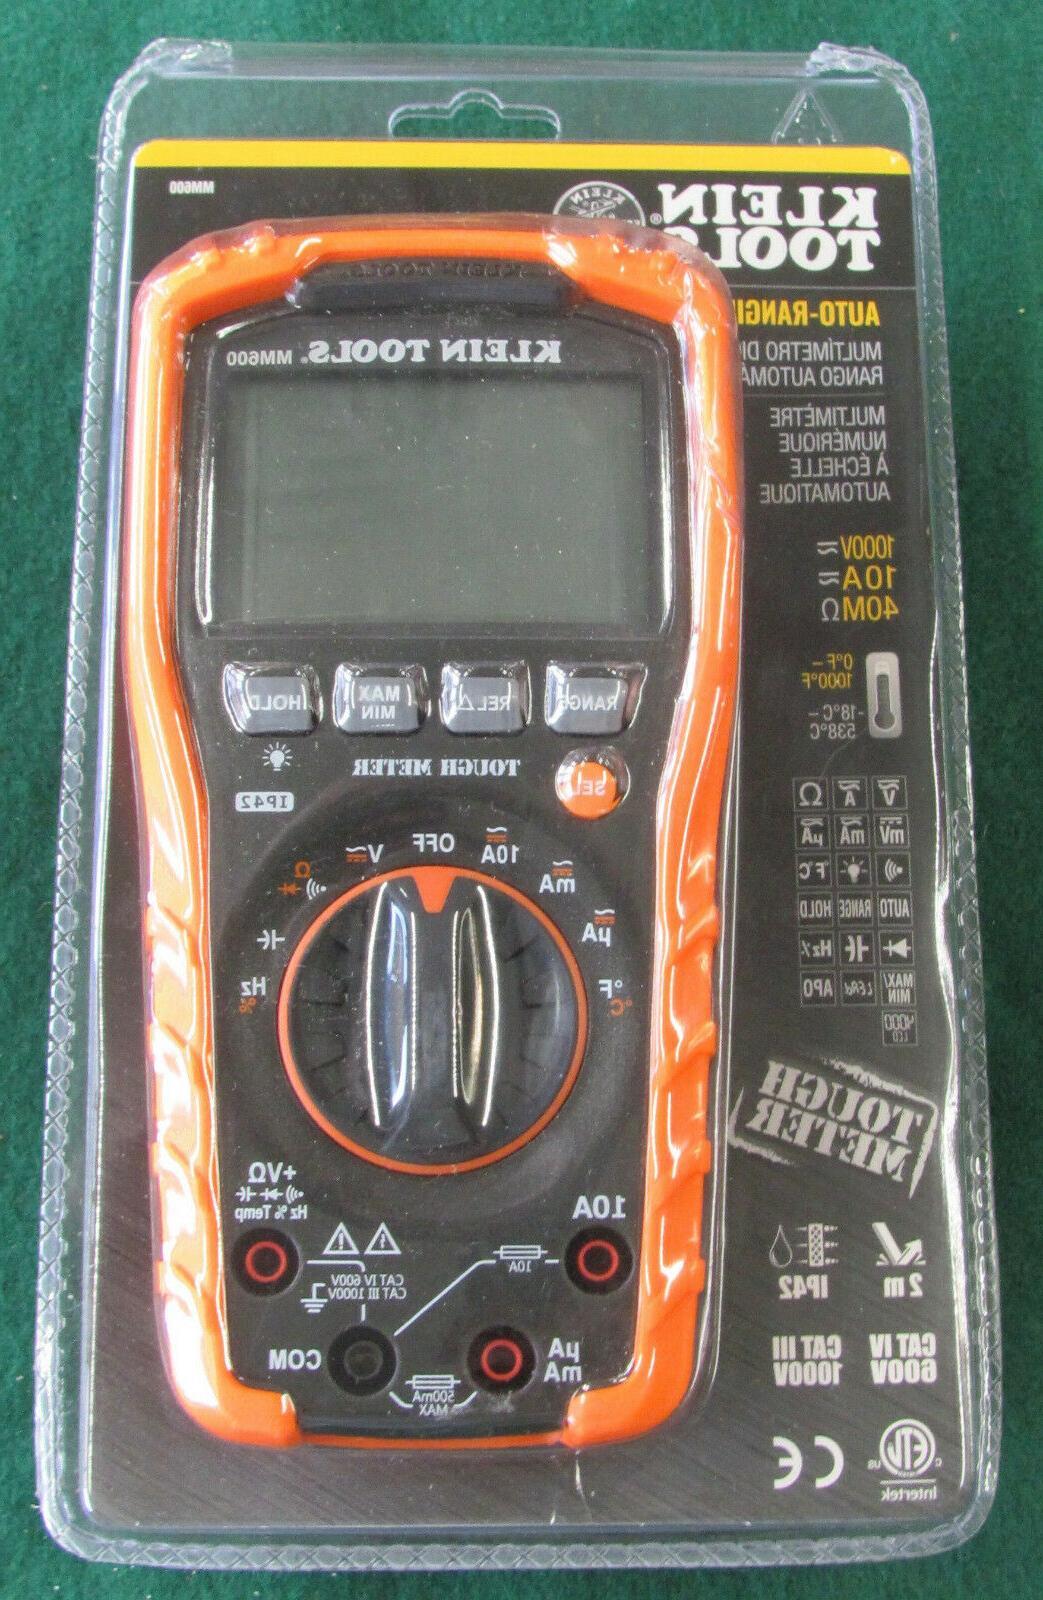 klein tool mm600 digital multimeter auto ranging